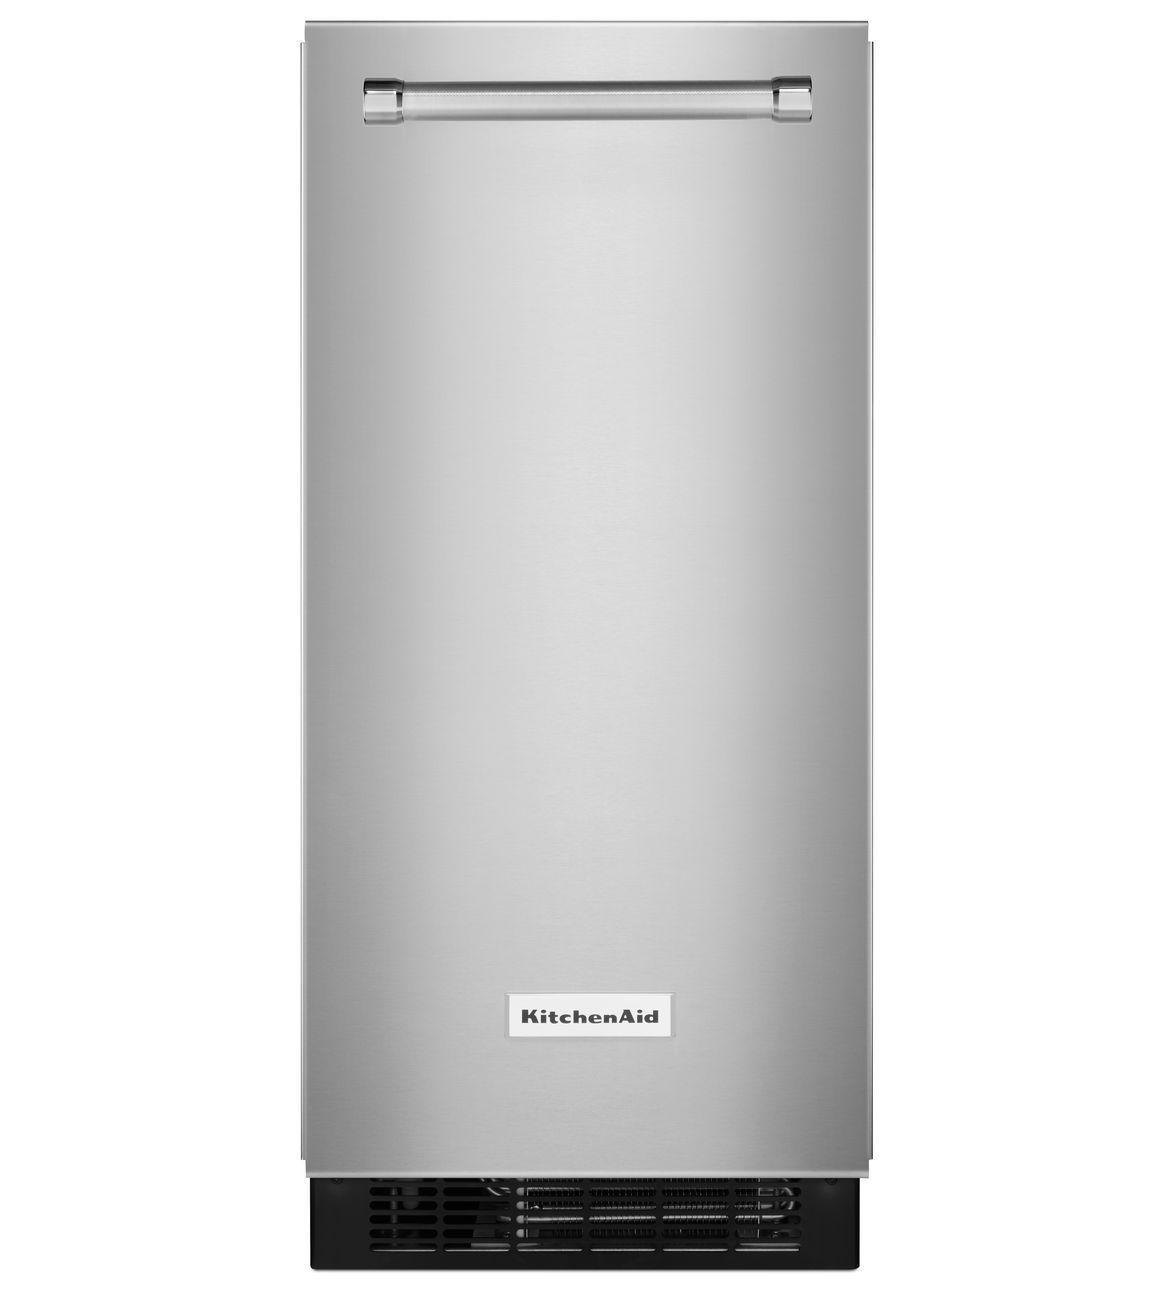 Kitchen Aid Ice Maker: Kitchenaid Kuix505ess